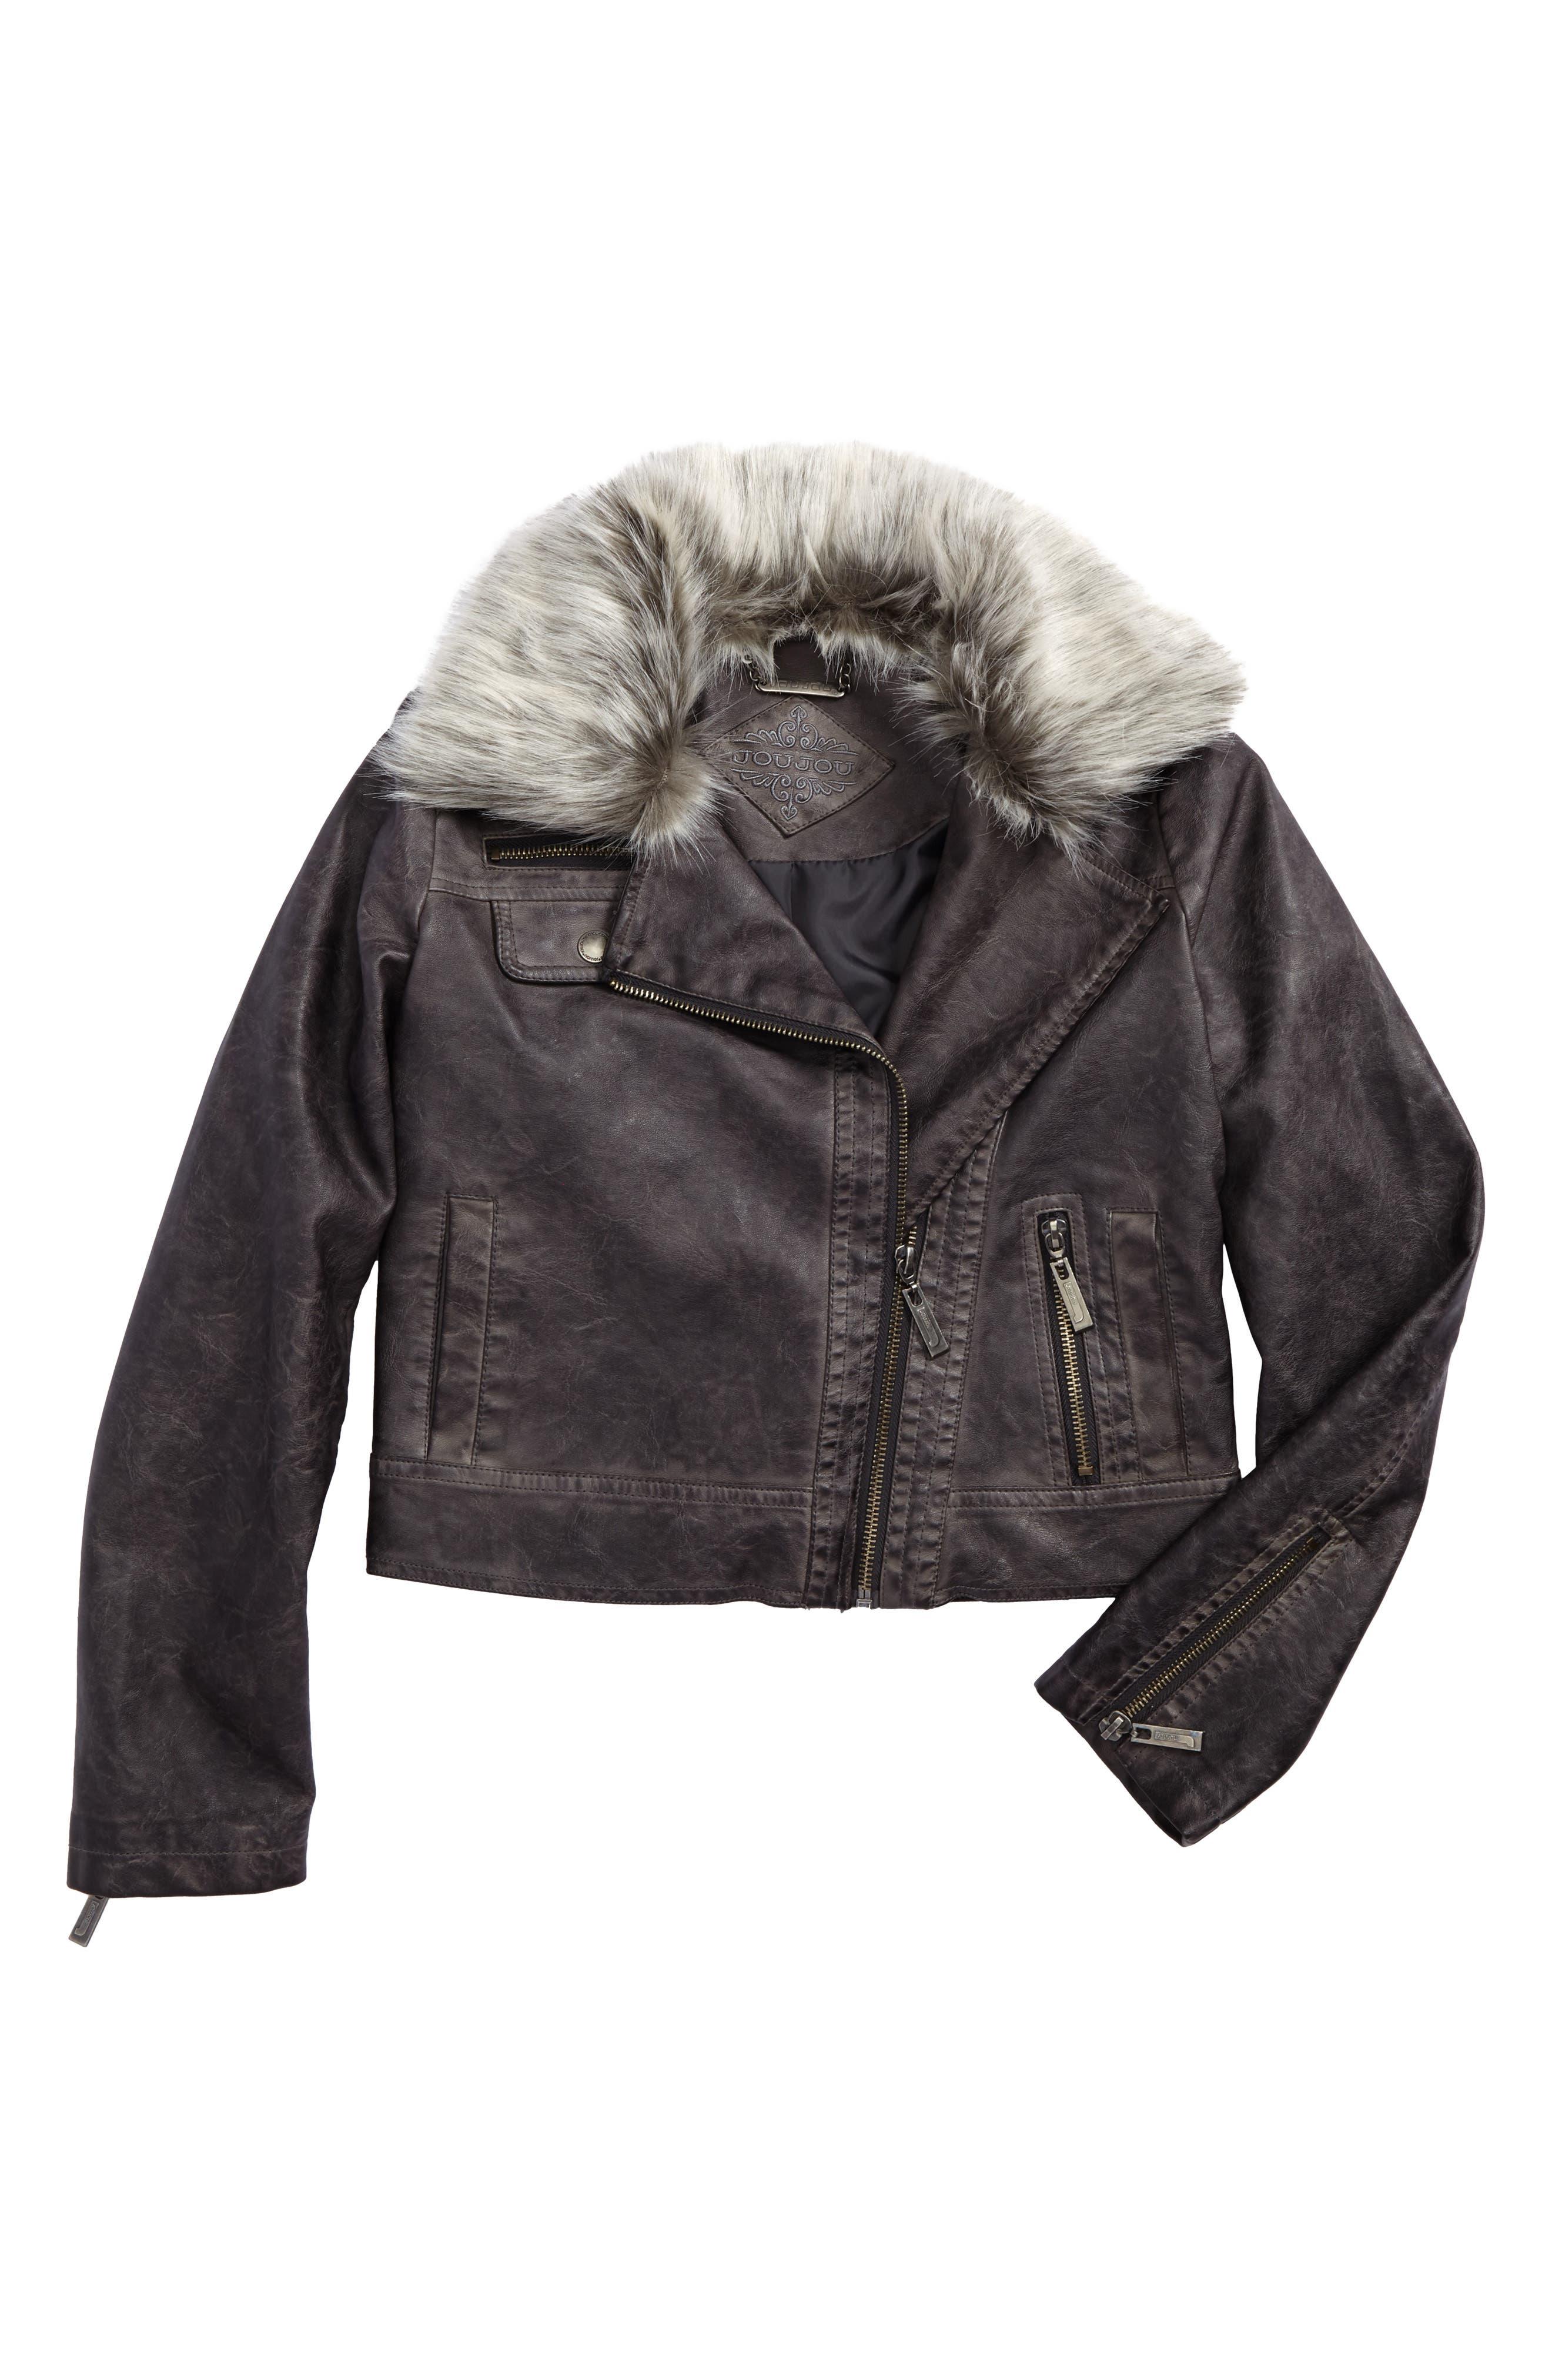 Jou Jou Faux Leather Jacket with Faux Fur Trim (Big Girls)